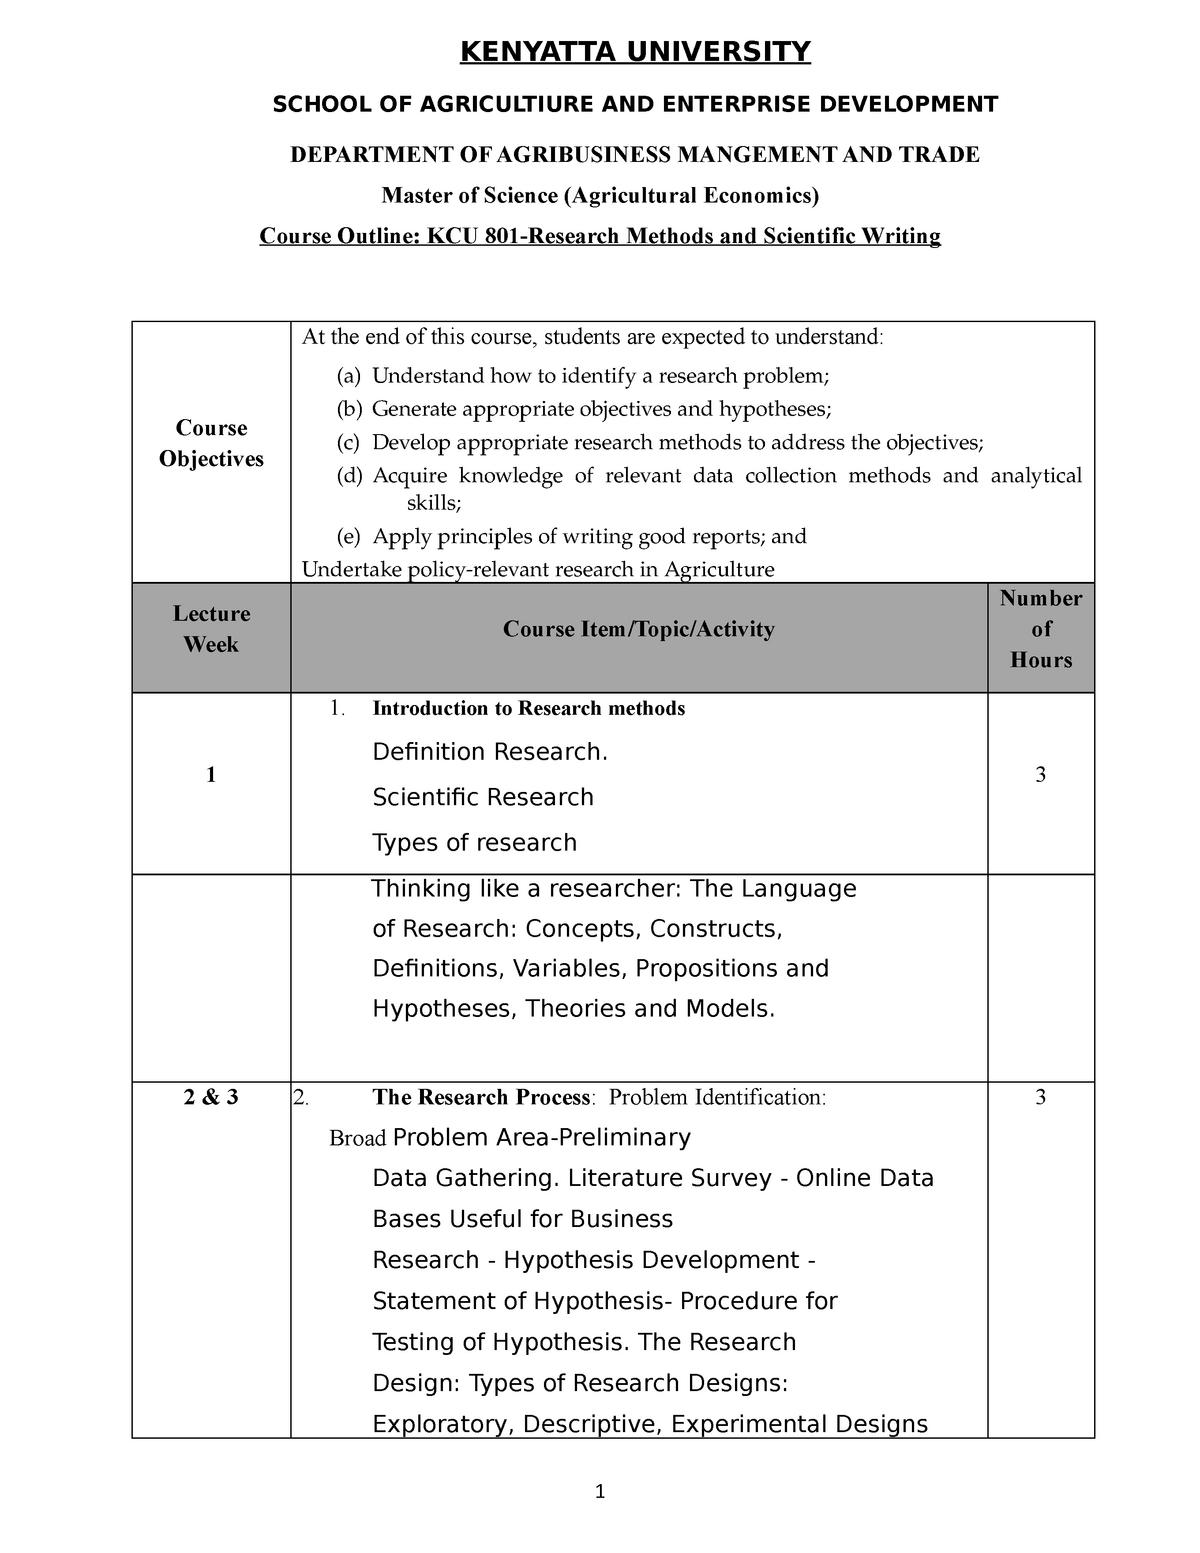 KCU 801 Research Methods - KCU 301: Research Methods - StuDocu